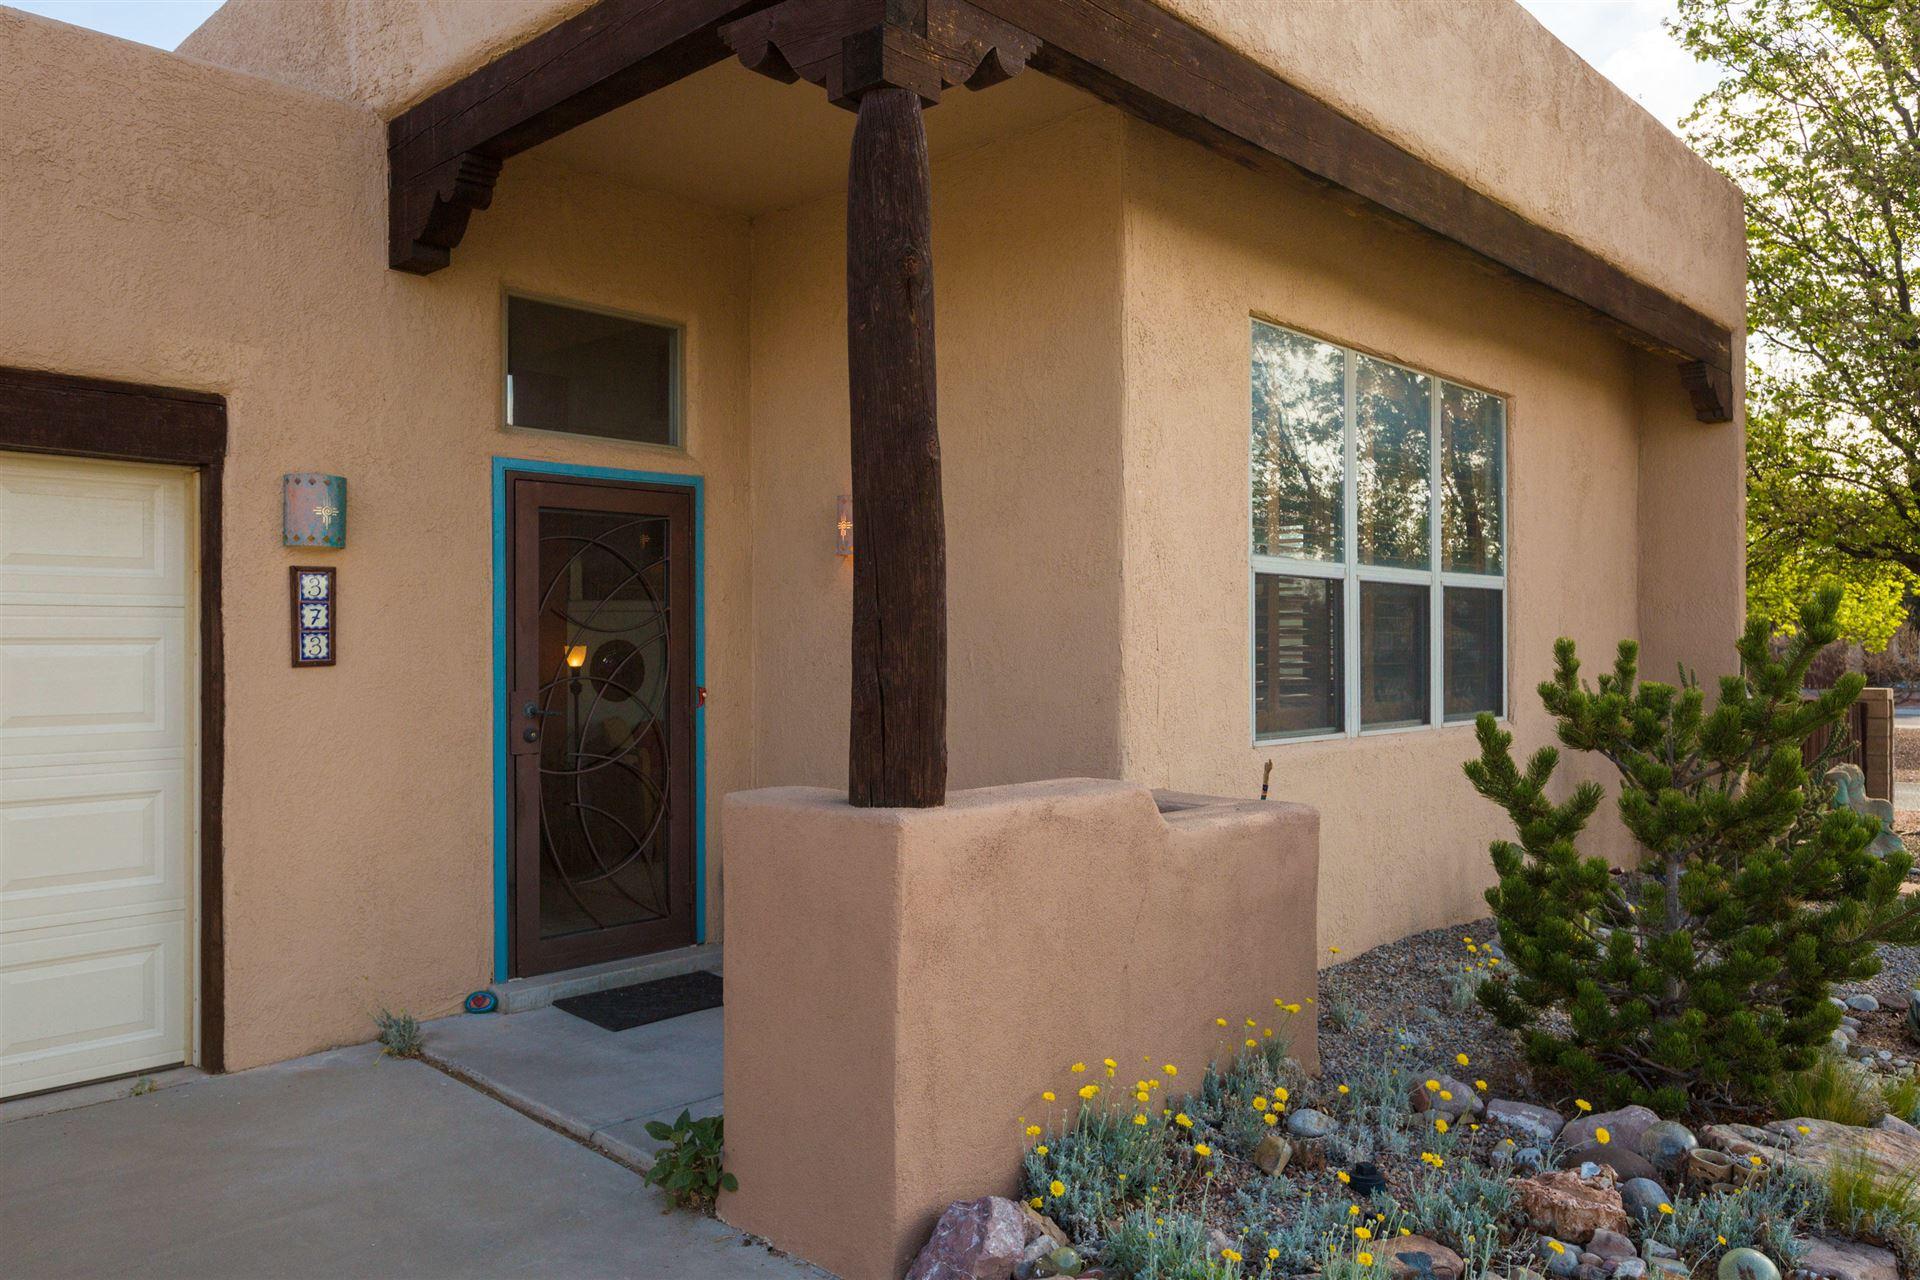 Photo of 373 LA CHAMISAL Lane NW, Los Ranchos, NM 87107 (MLS # 989834)